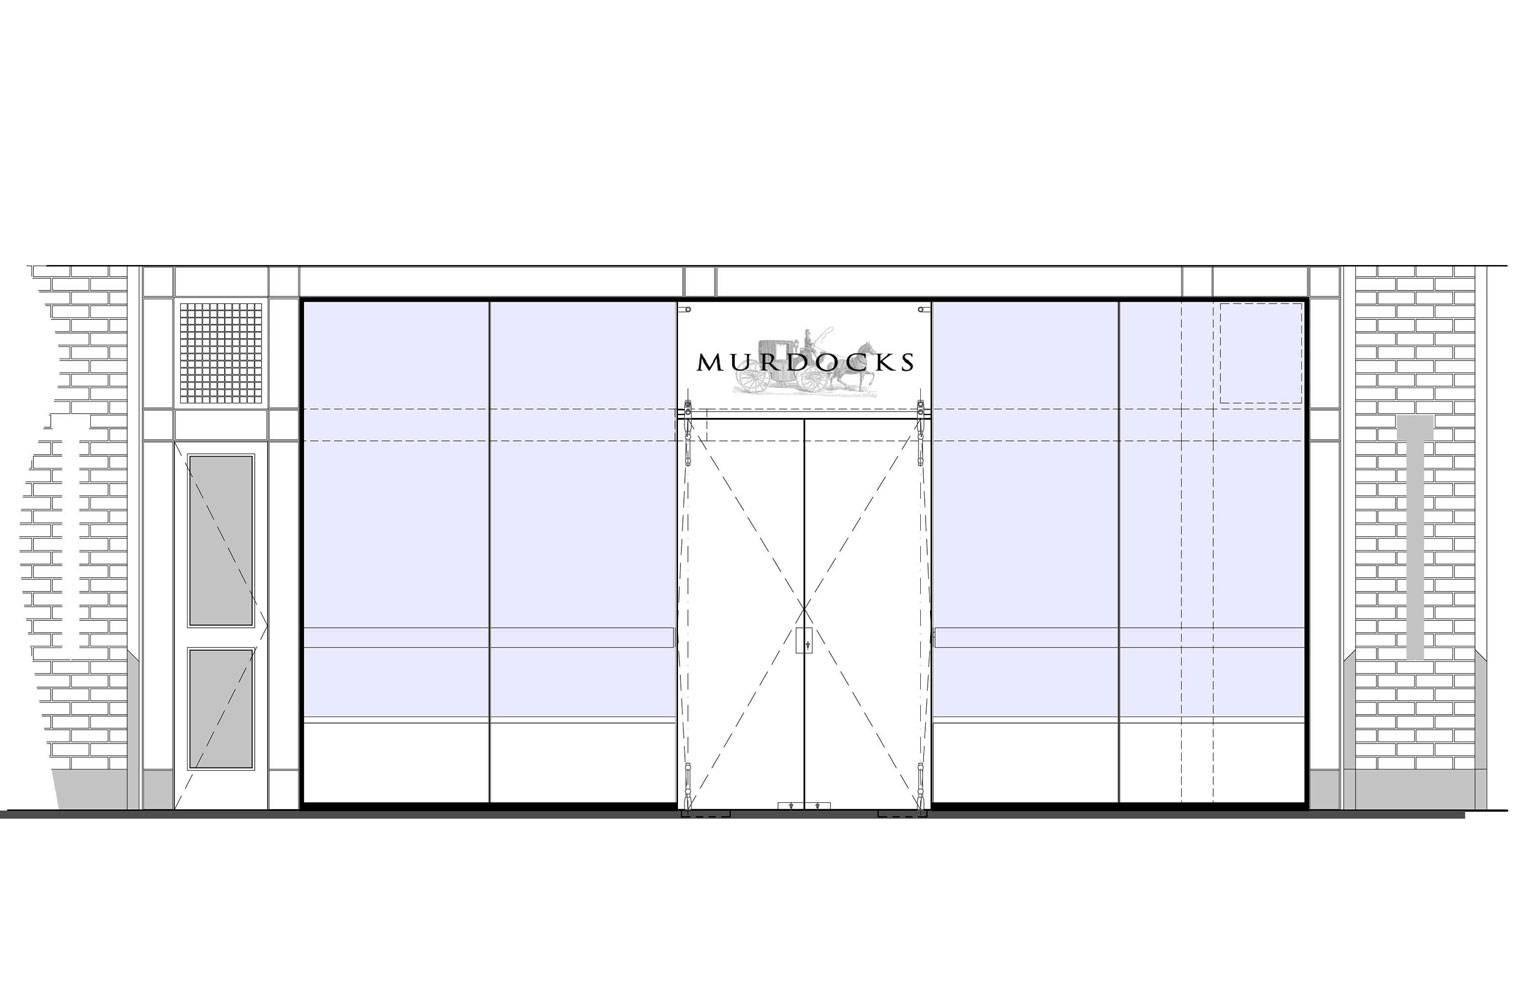 Murdocks - Mall Elevation